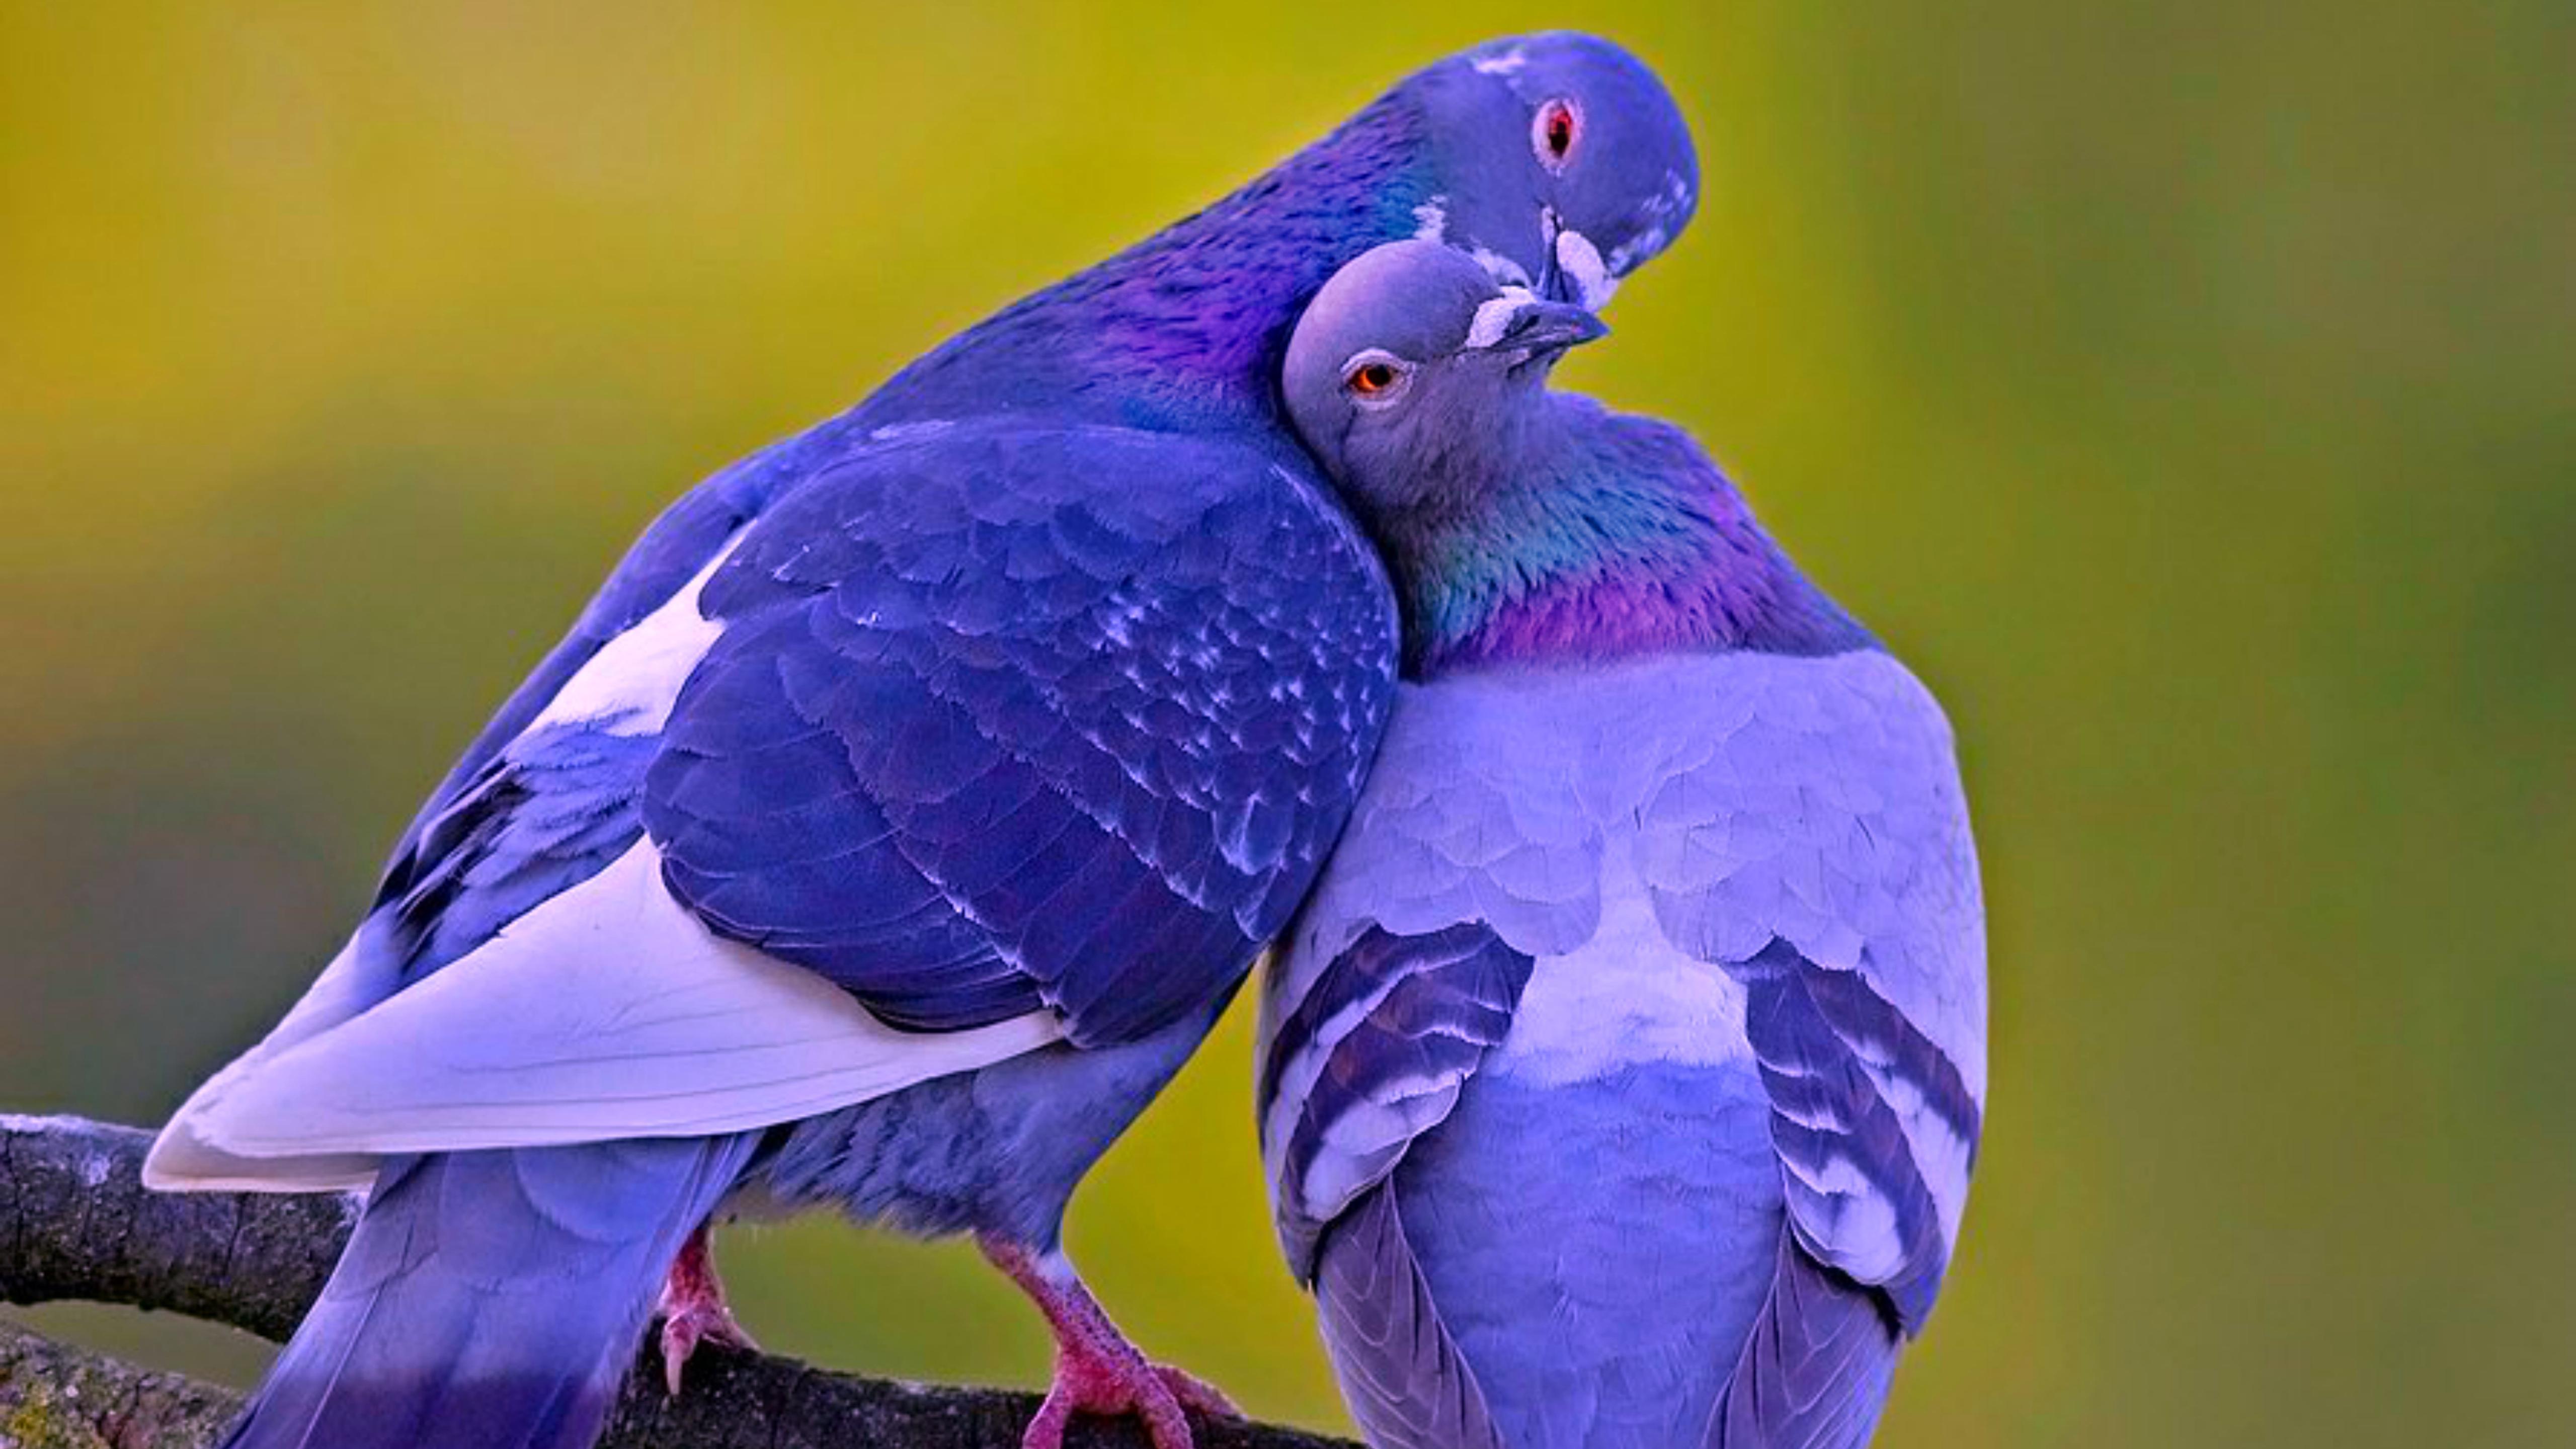 Секс с птицей фото 11 фотография